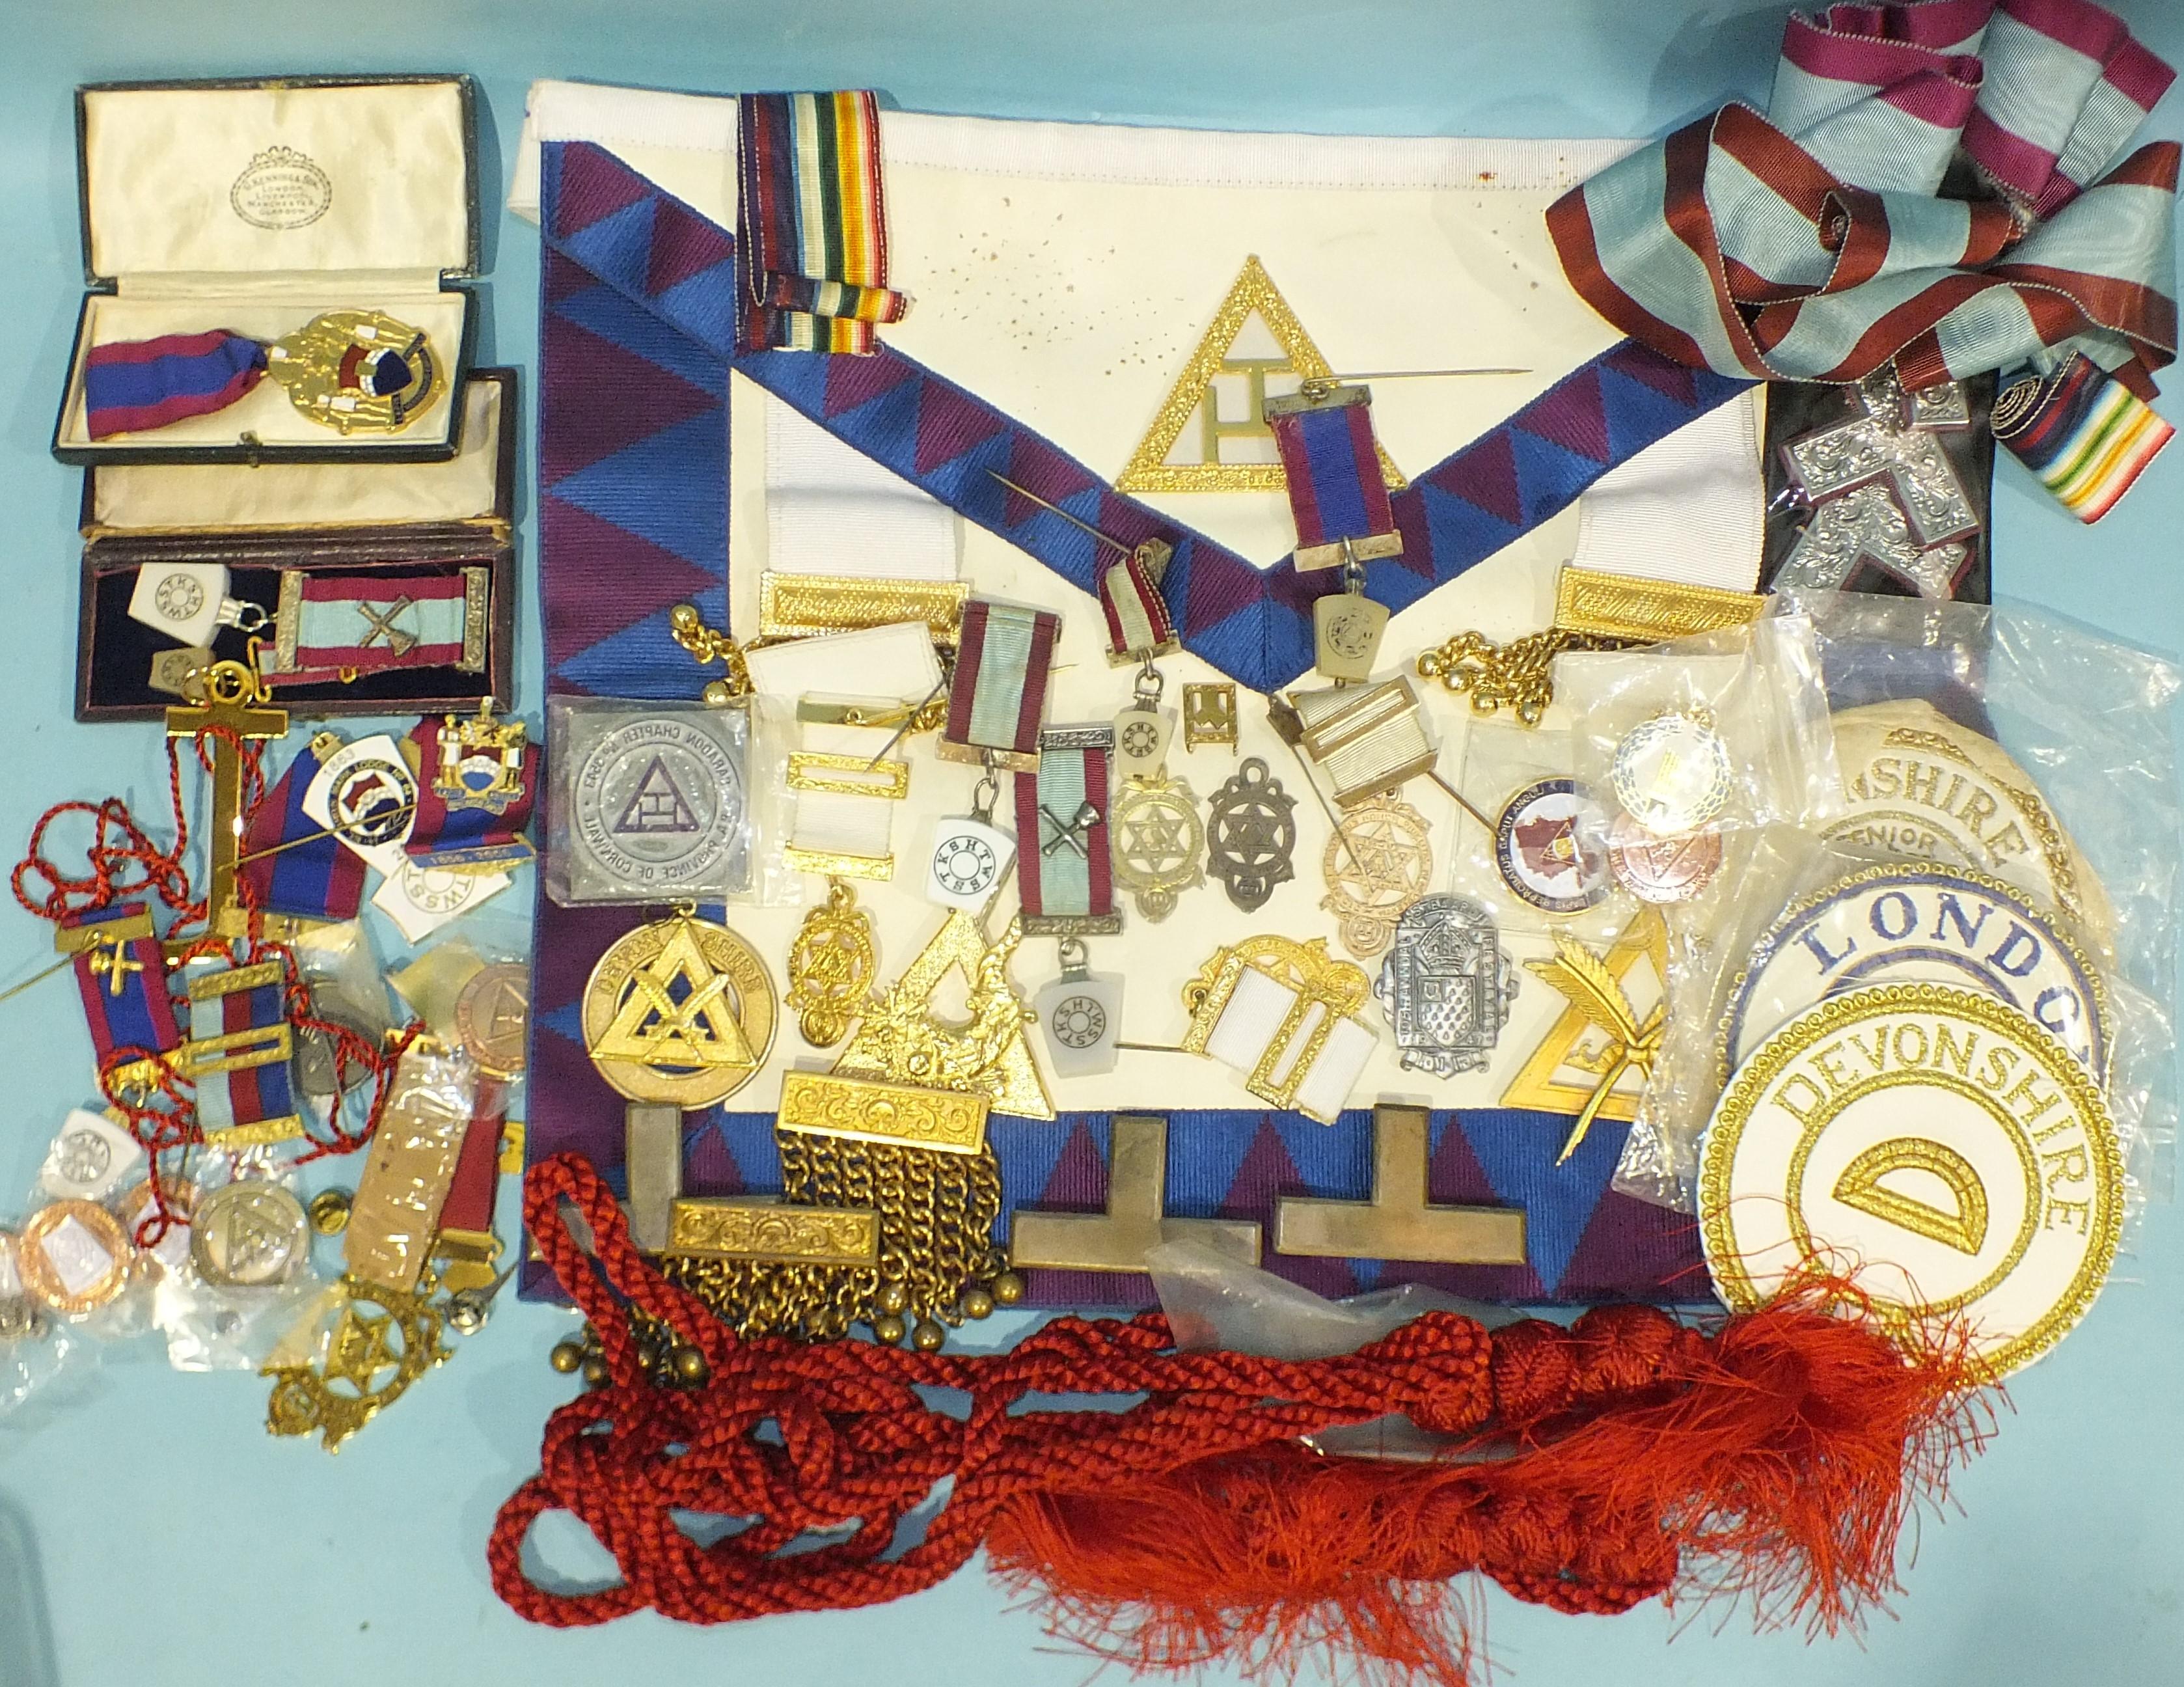 Masonic interest: two small silver-gilt HRA Chapter jewels, two silver-mounted Mark Master Masons